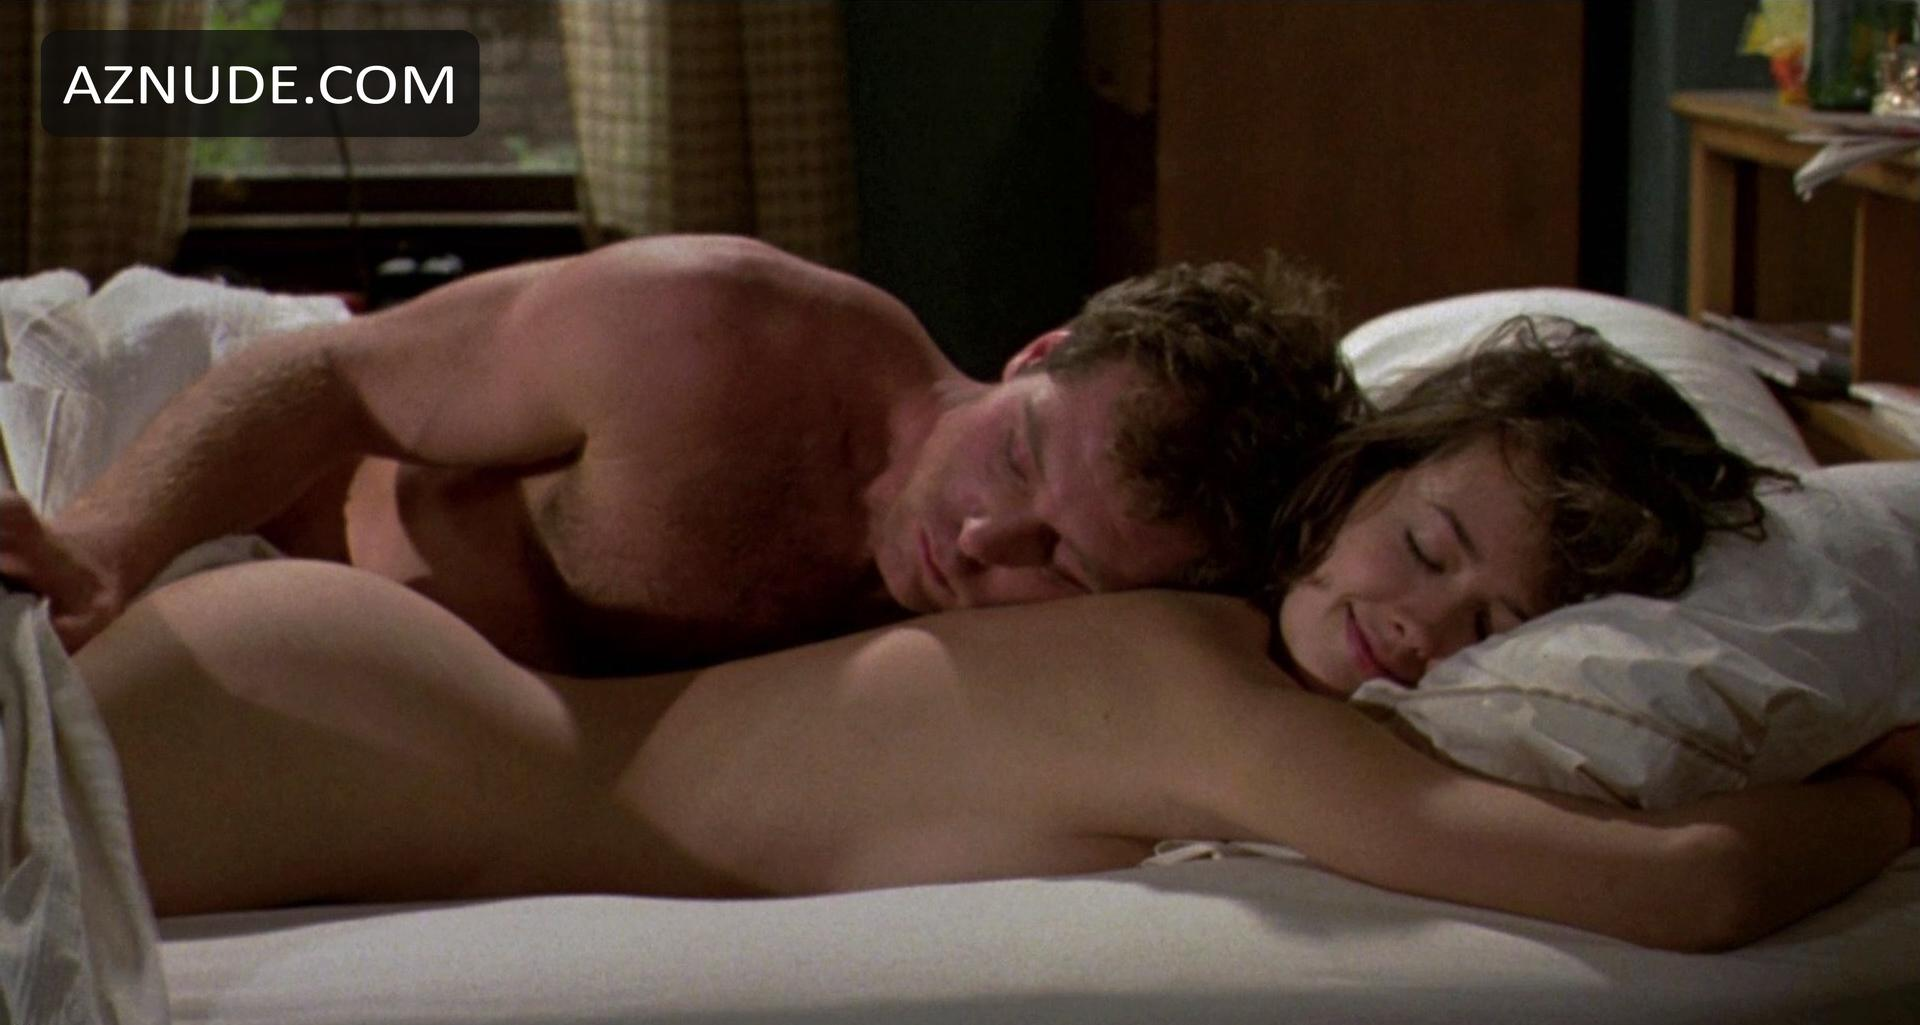 Joan chen nude sex scene in the hunted scandalplanetcom - 3 part 8